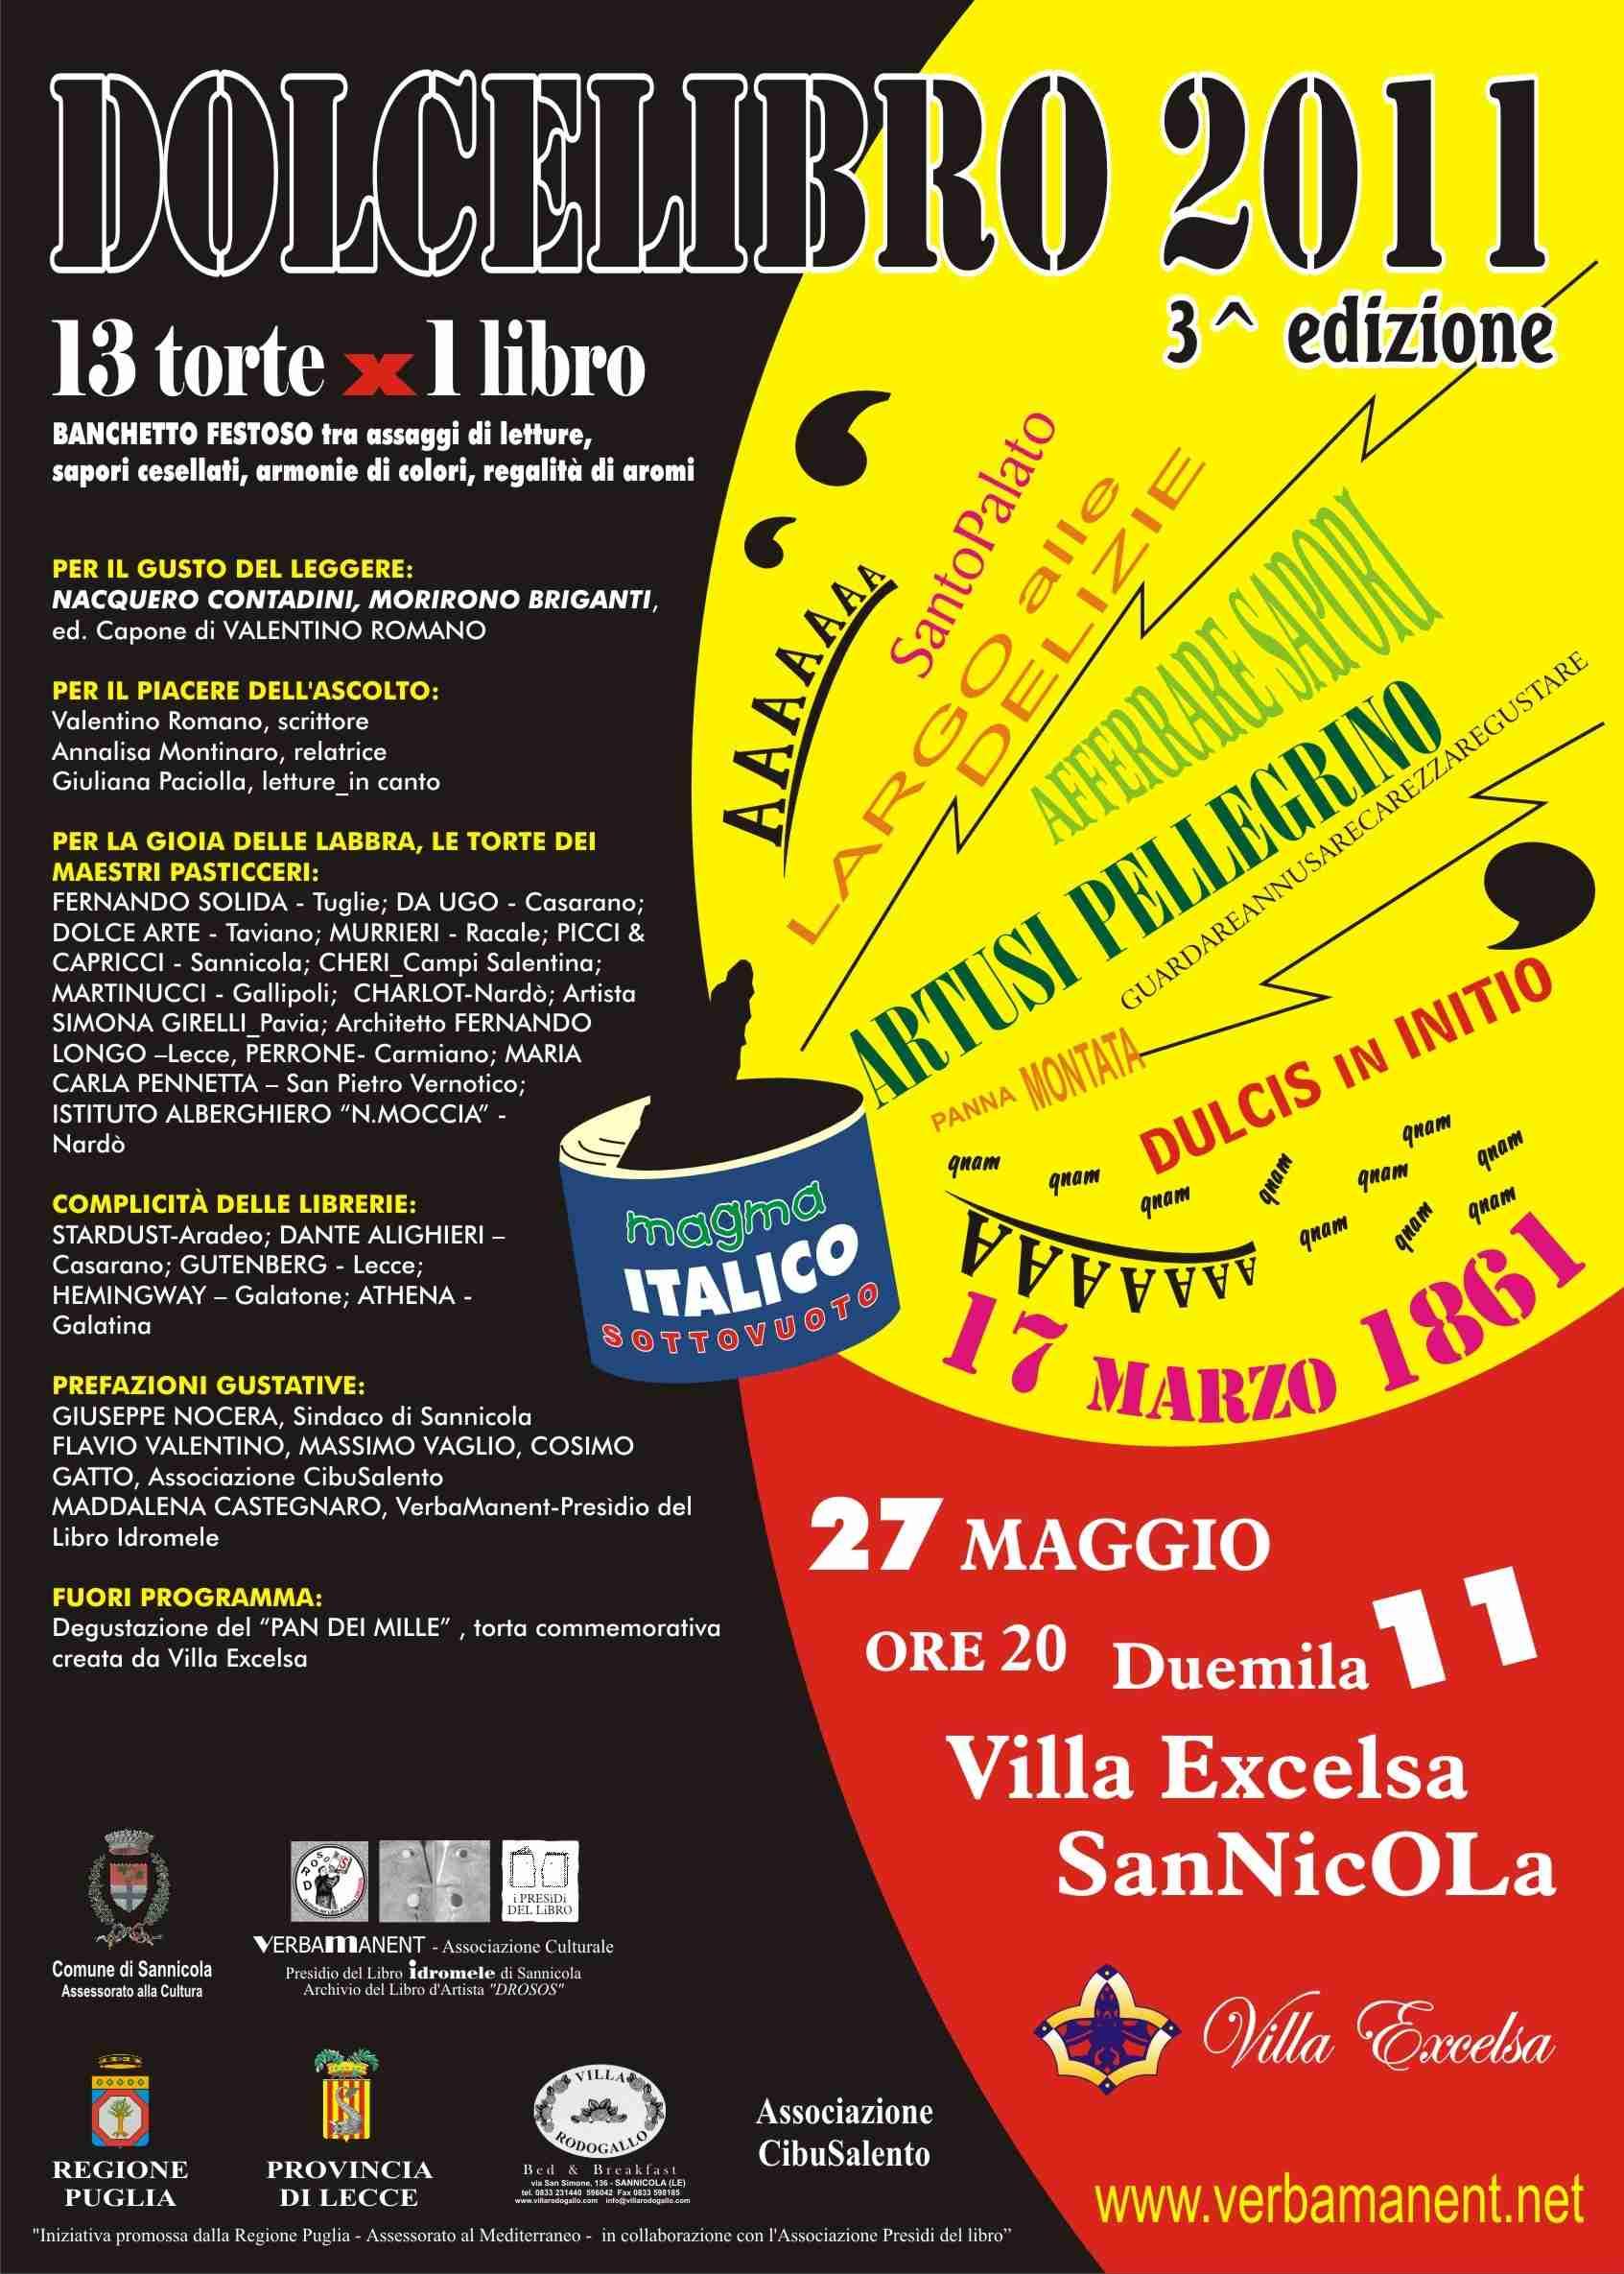 dolcelibro-2011-manifesto